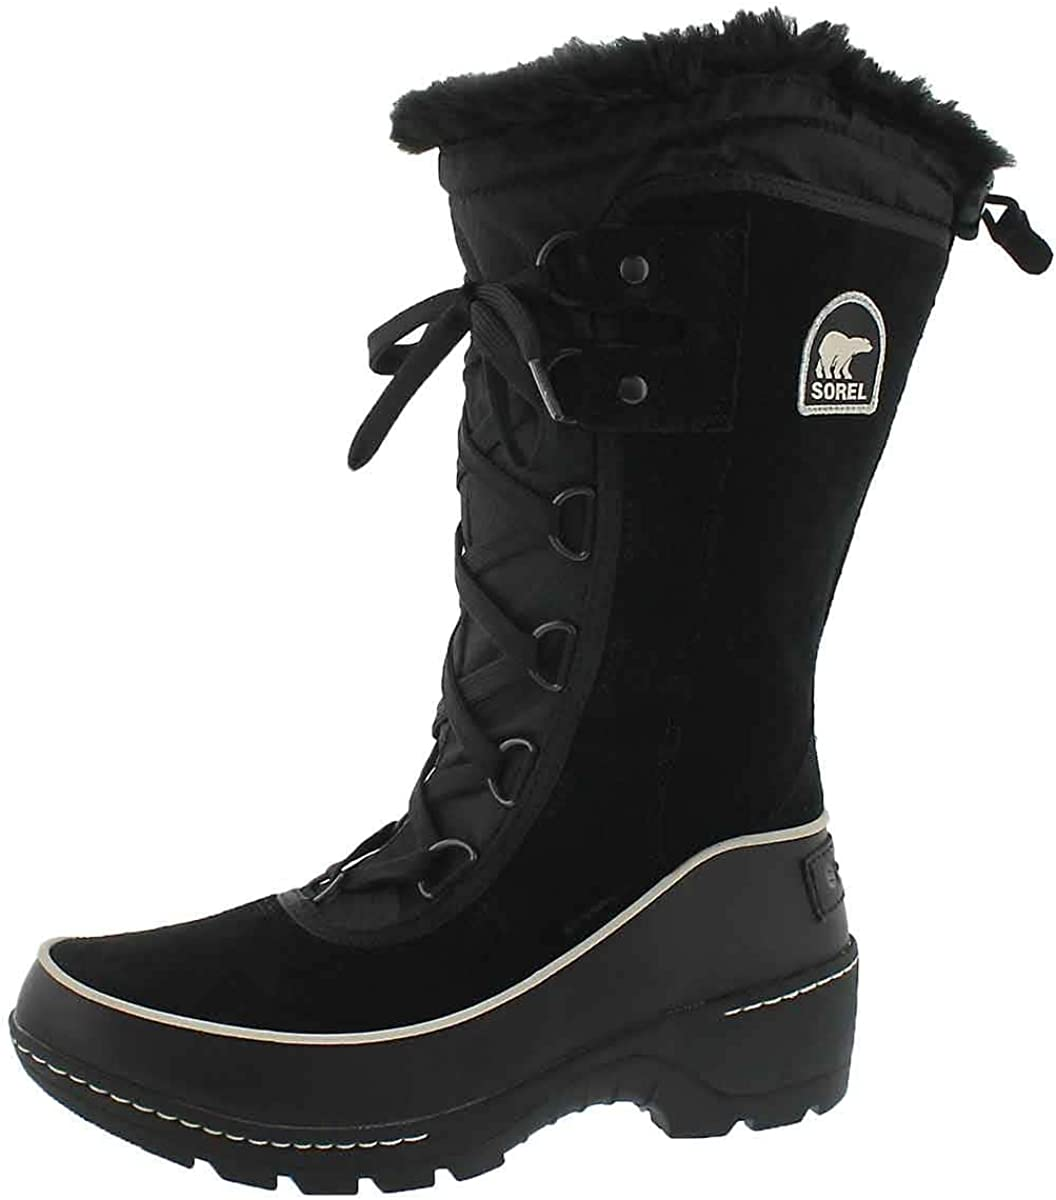 Sorel Tivoli III High Cheap super Regular dealer special price Outdoor Women's Boot